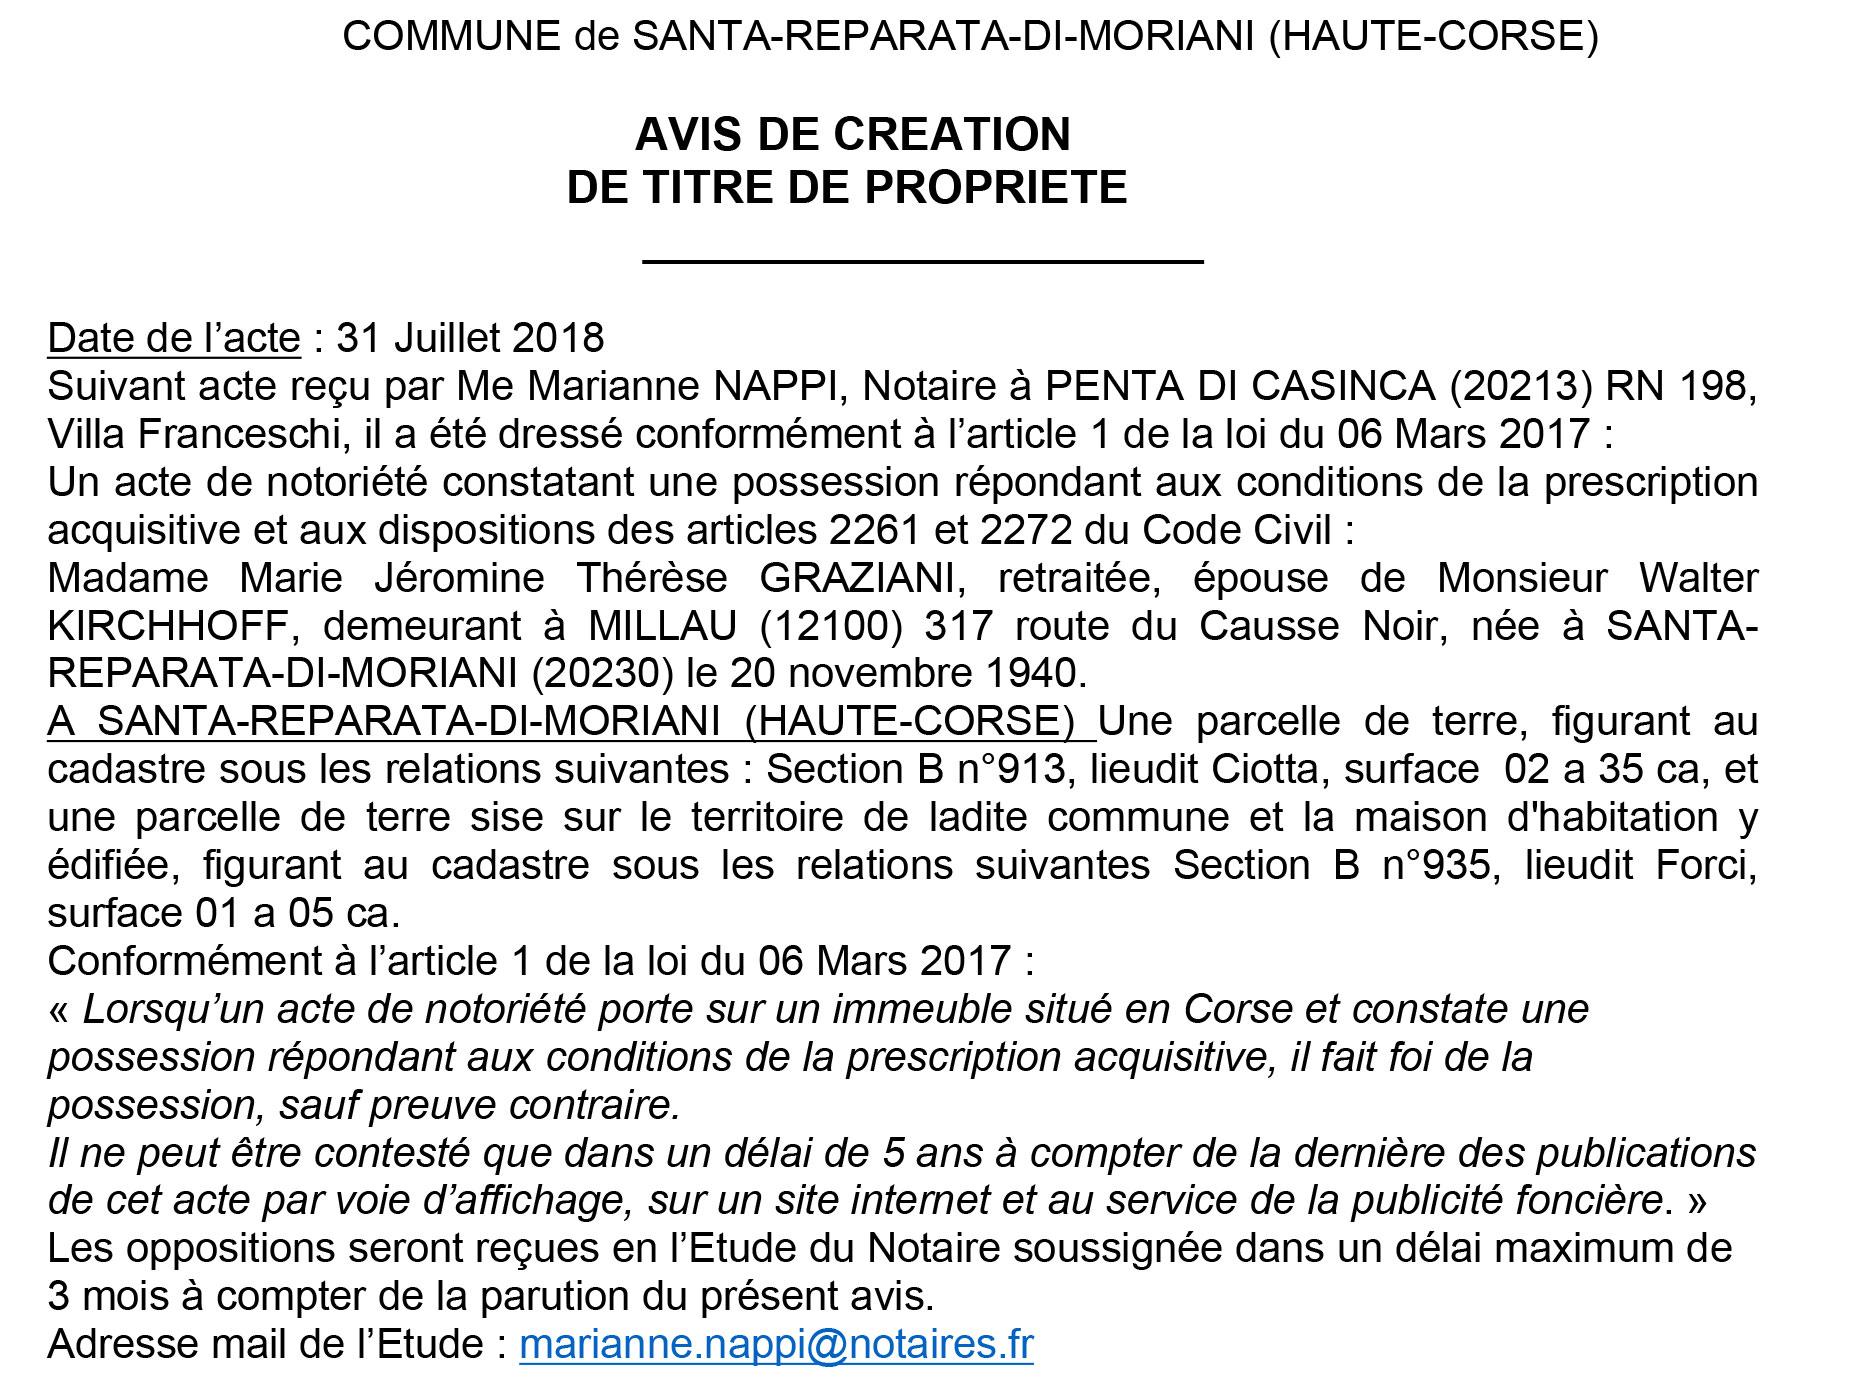 Avis de création de titre de propriété - commune de Santa Reparata di Moriani (Haute-Corse)